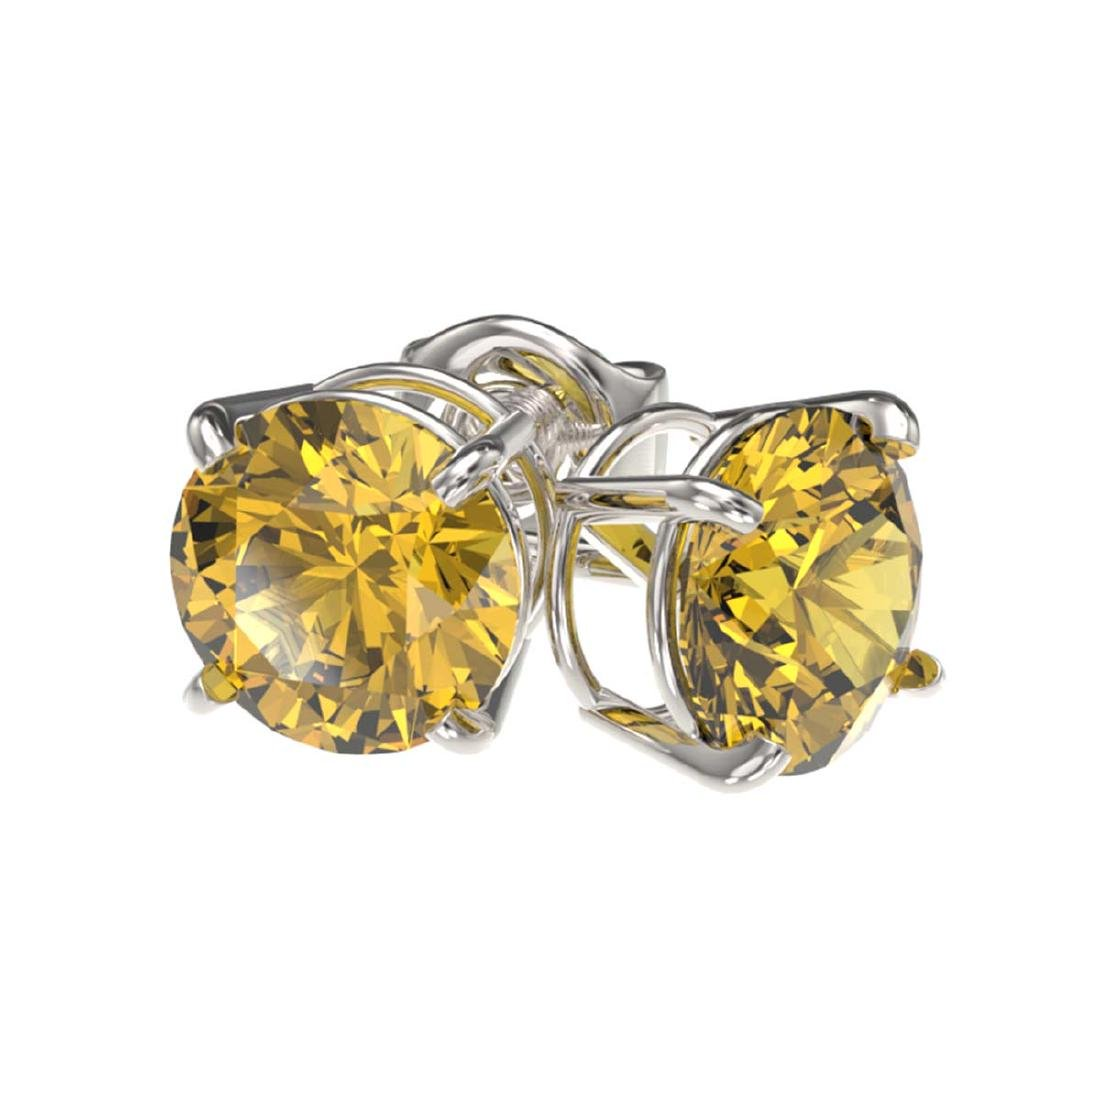 1.50 ctw Intense Yellow Diamond Stud Earrings 10K White - 3